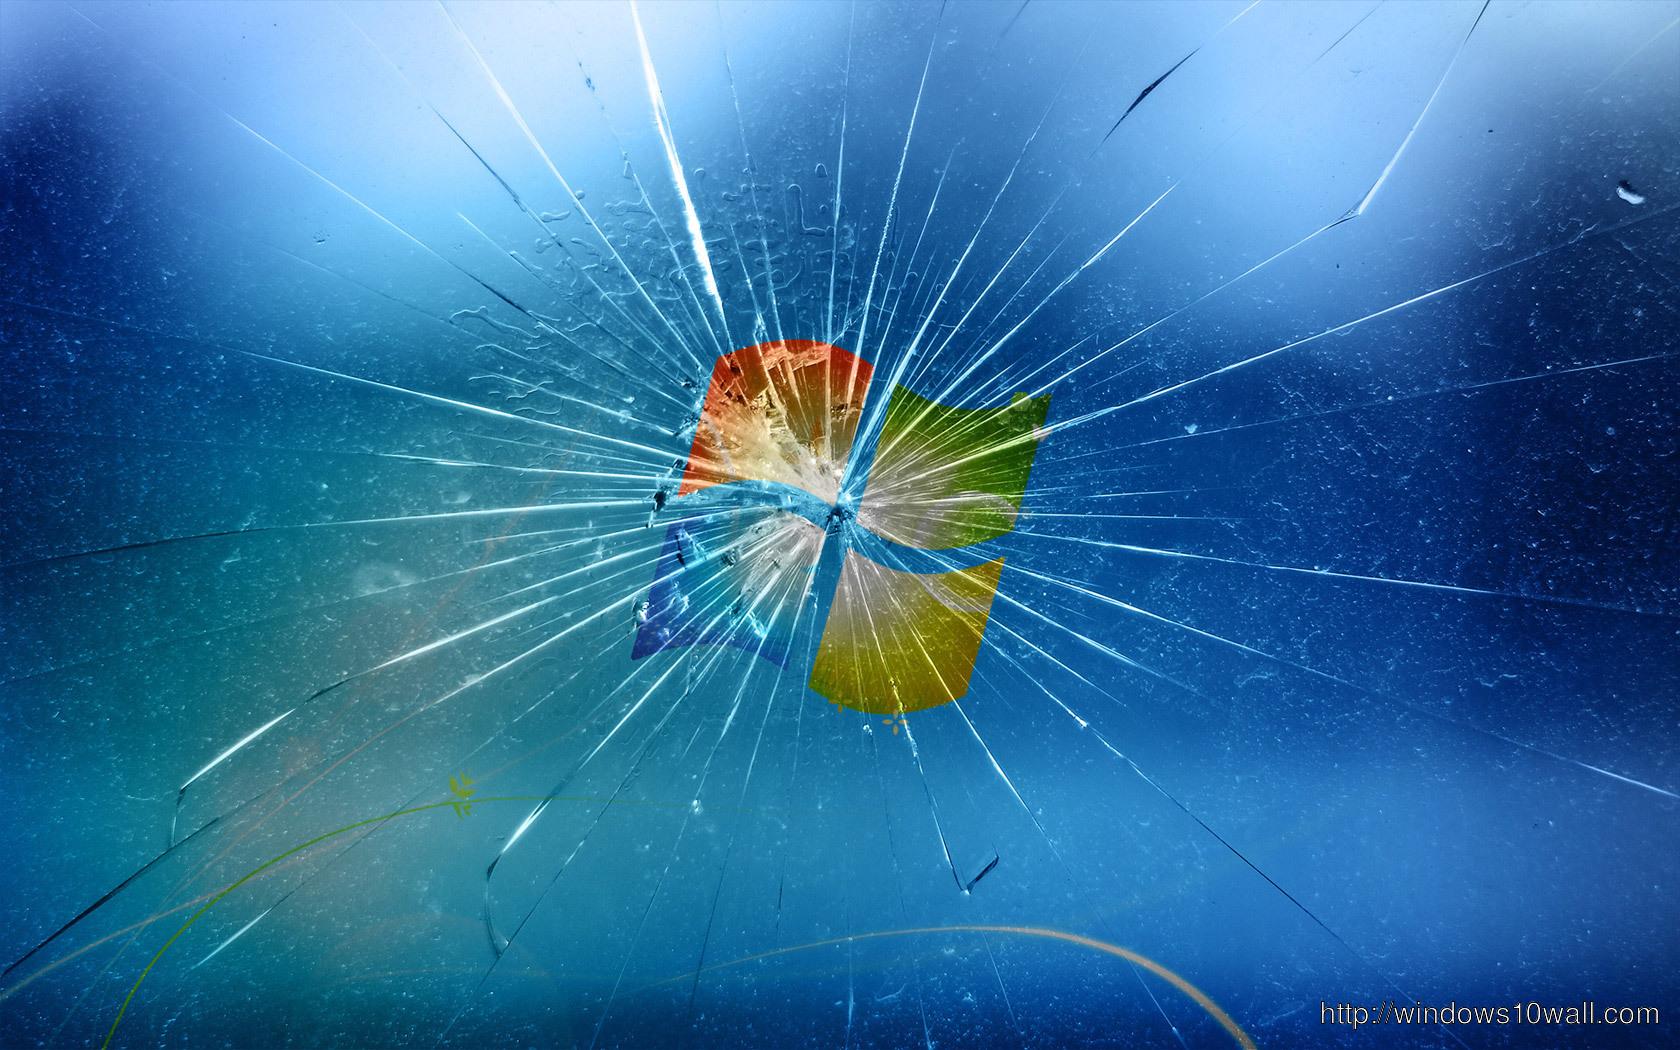 Windows 7 Broken Screen Hd wallpaper